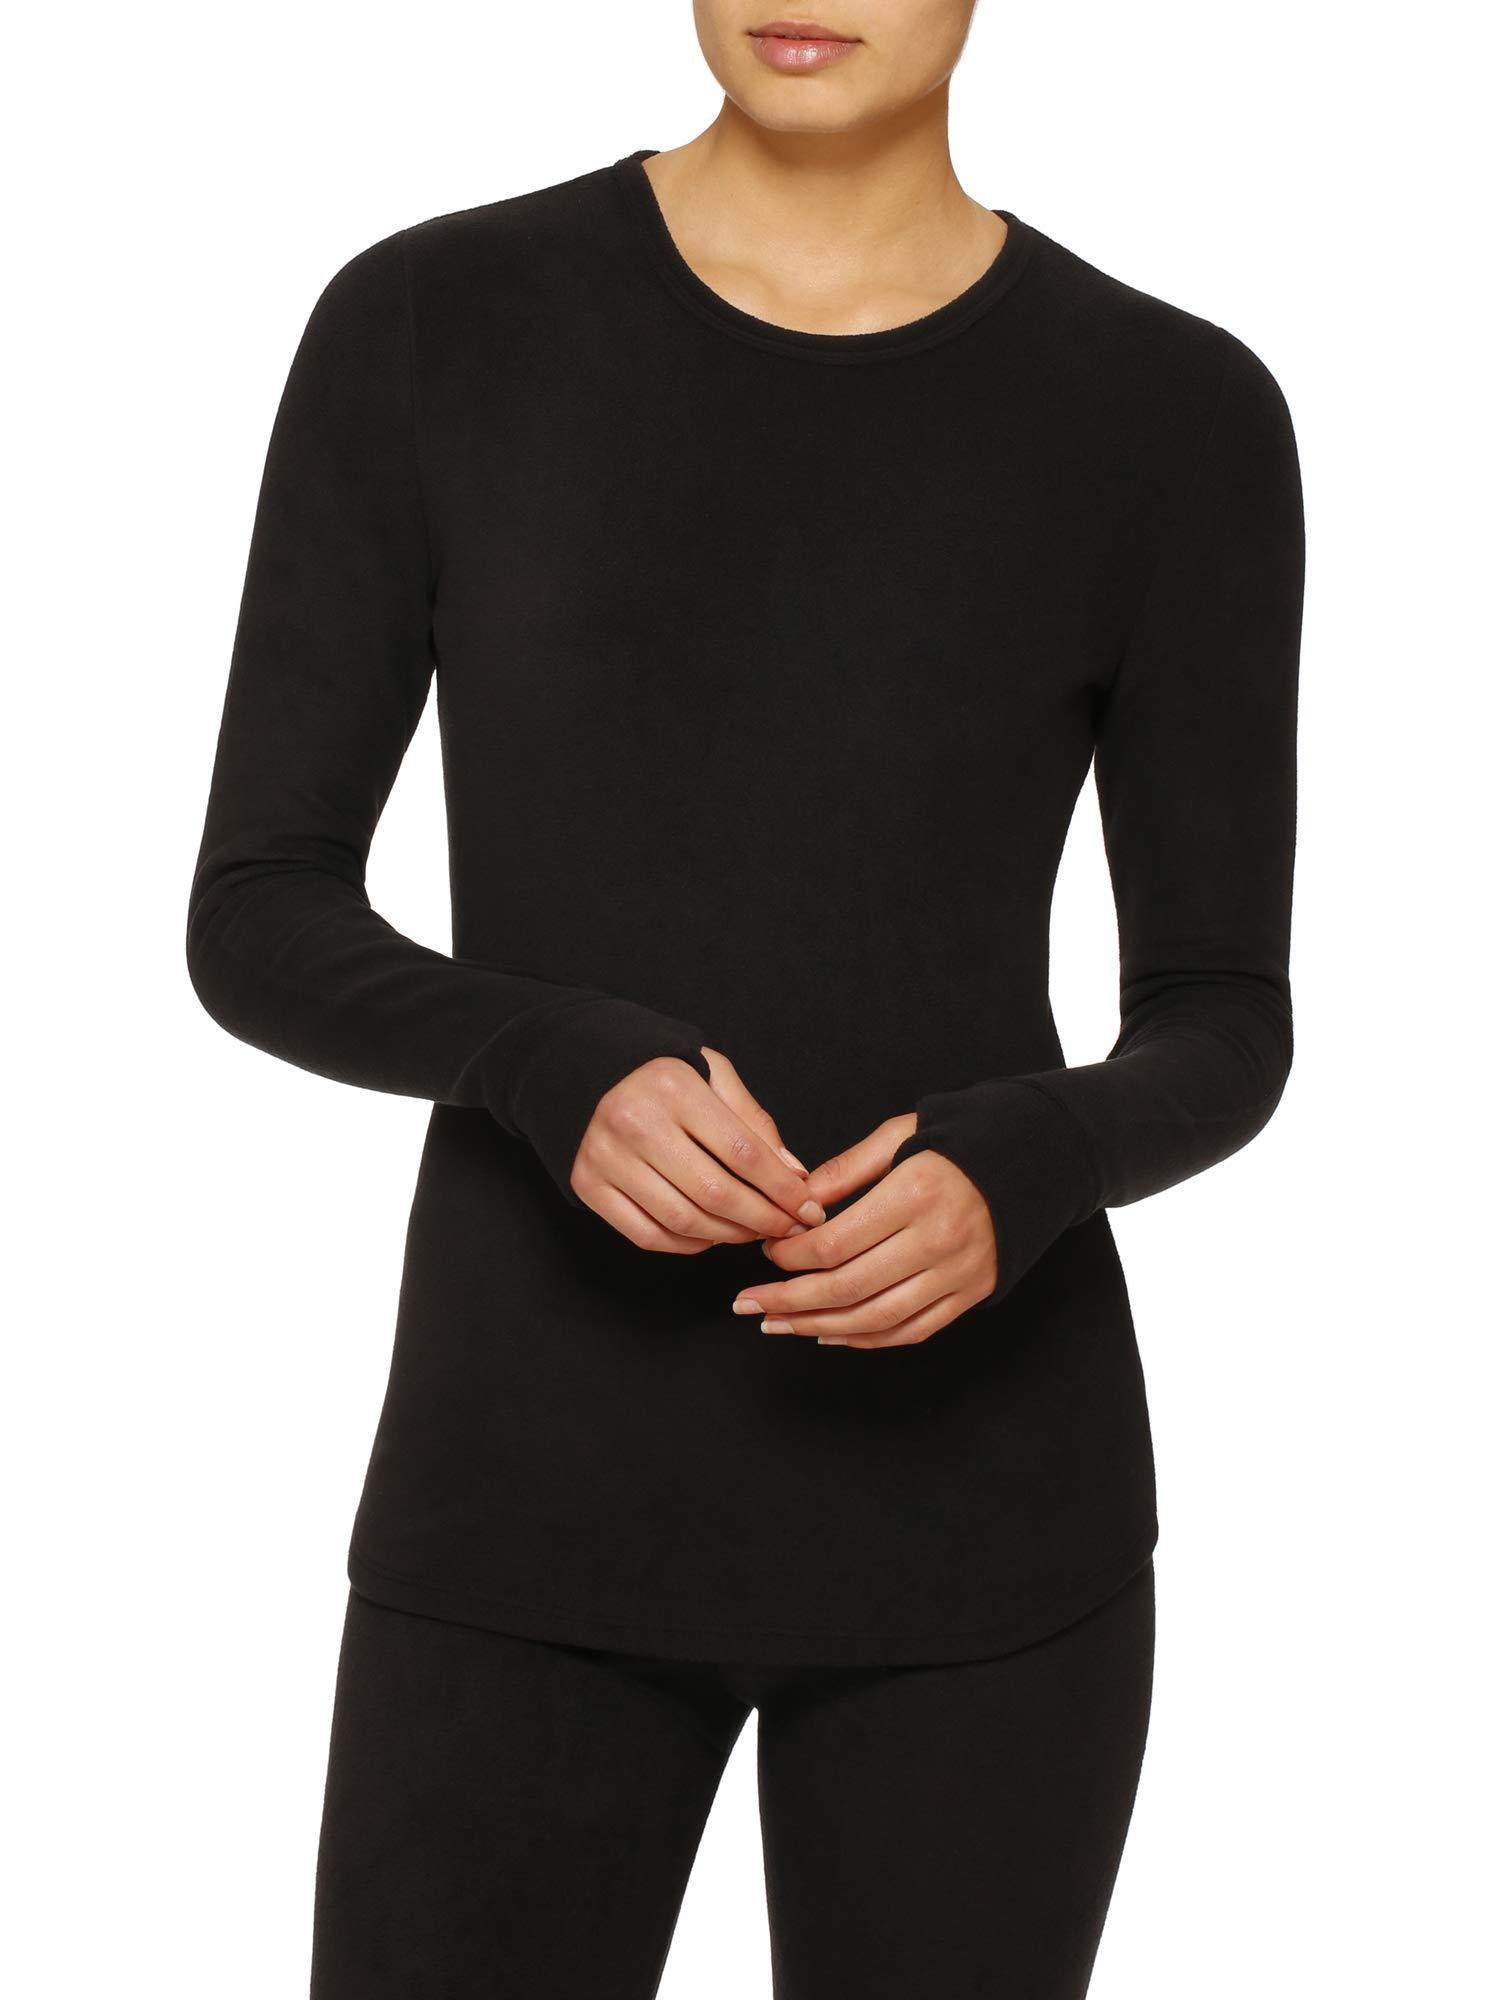 Cuddl Duds ClimateRight Women's Stretch Fleece Warm Underwear Long Sleeve Top (2XL - Black) by Cuddl Duds